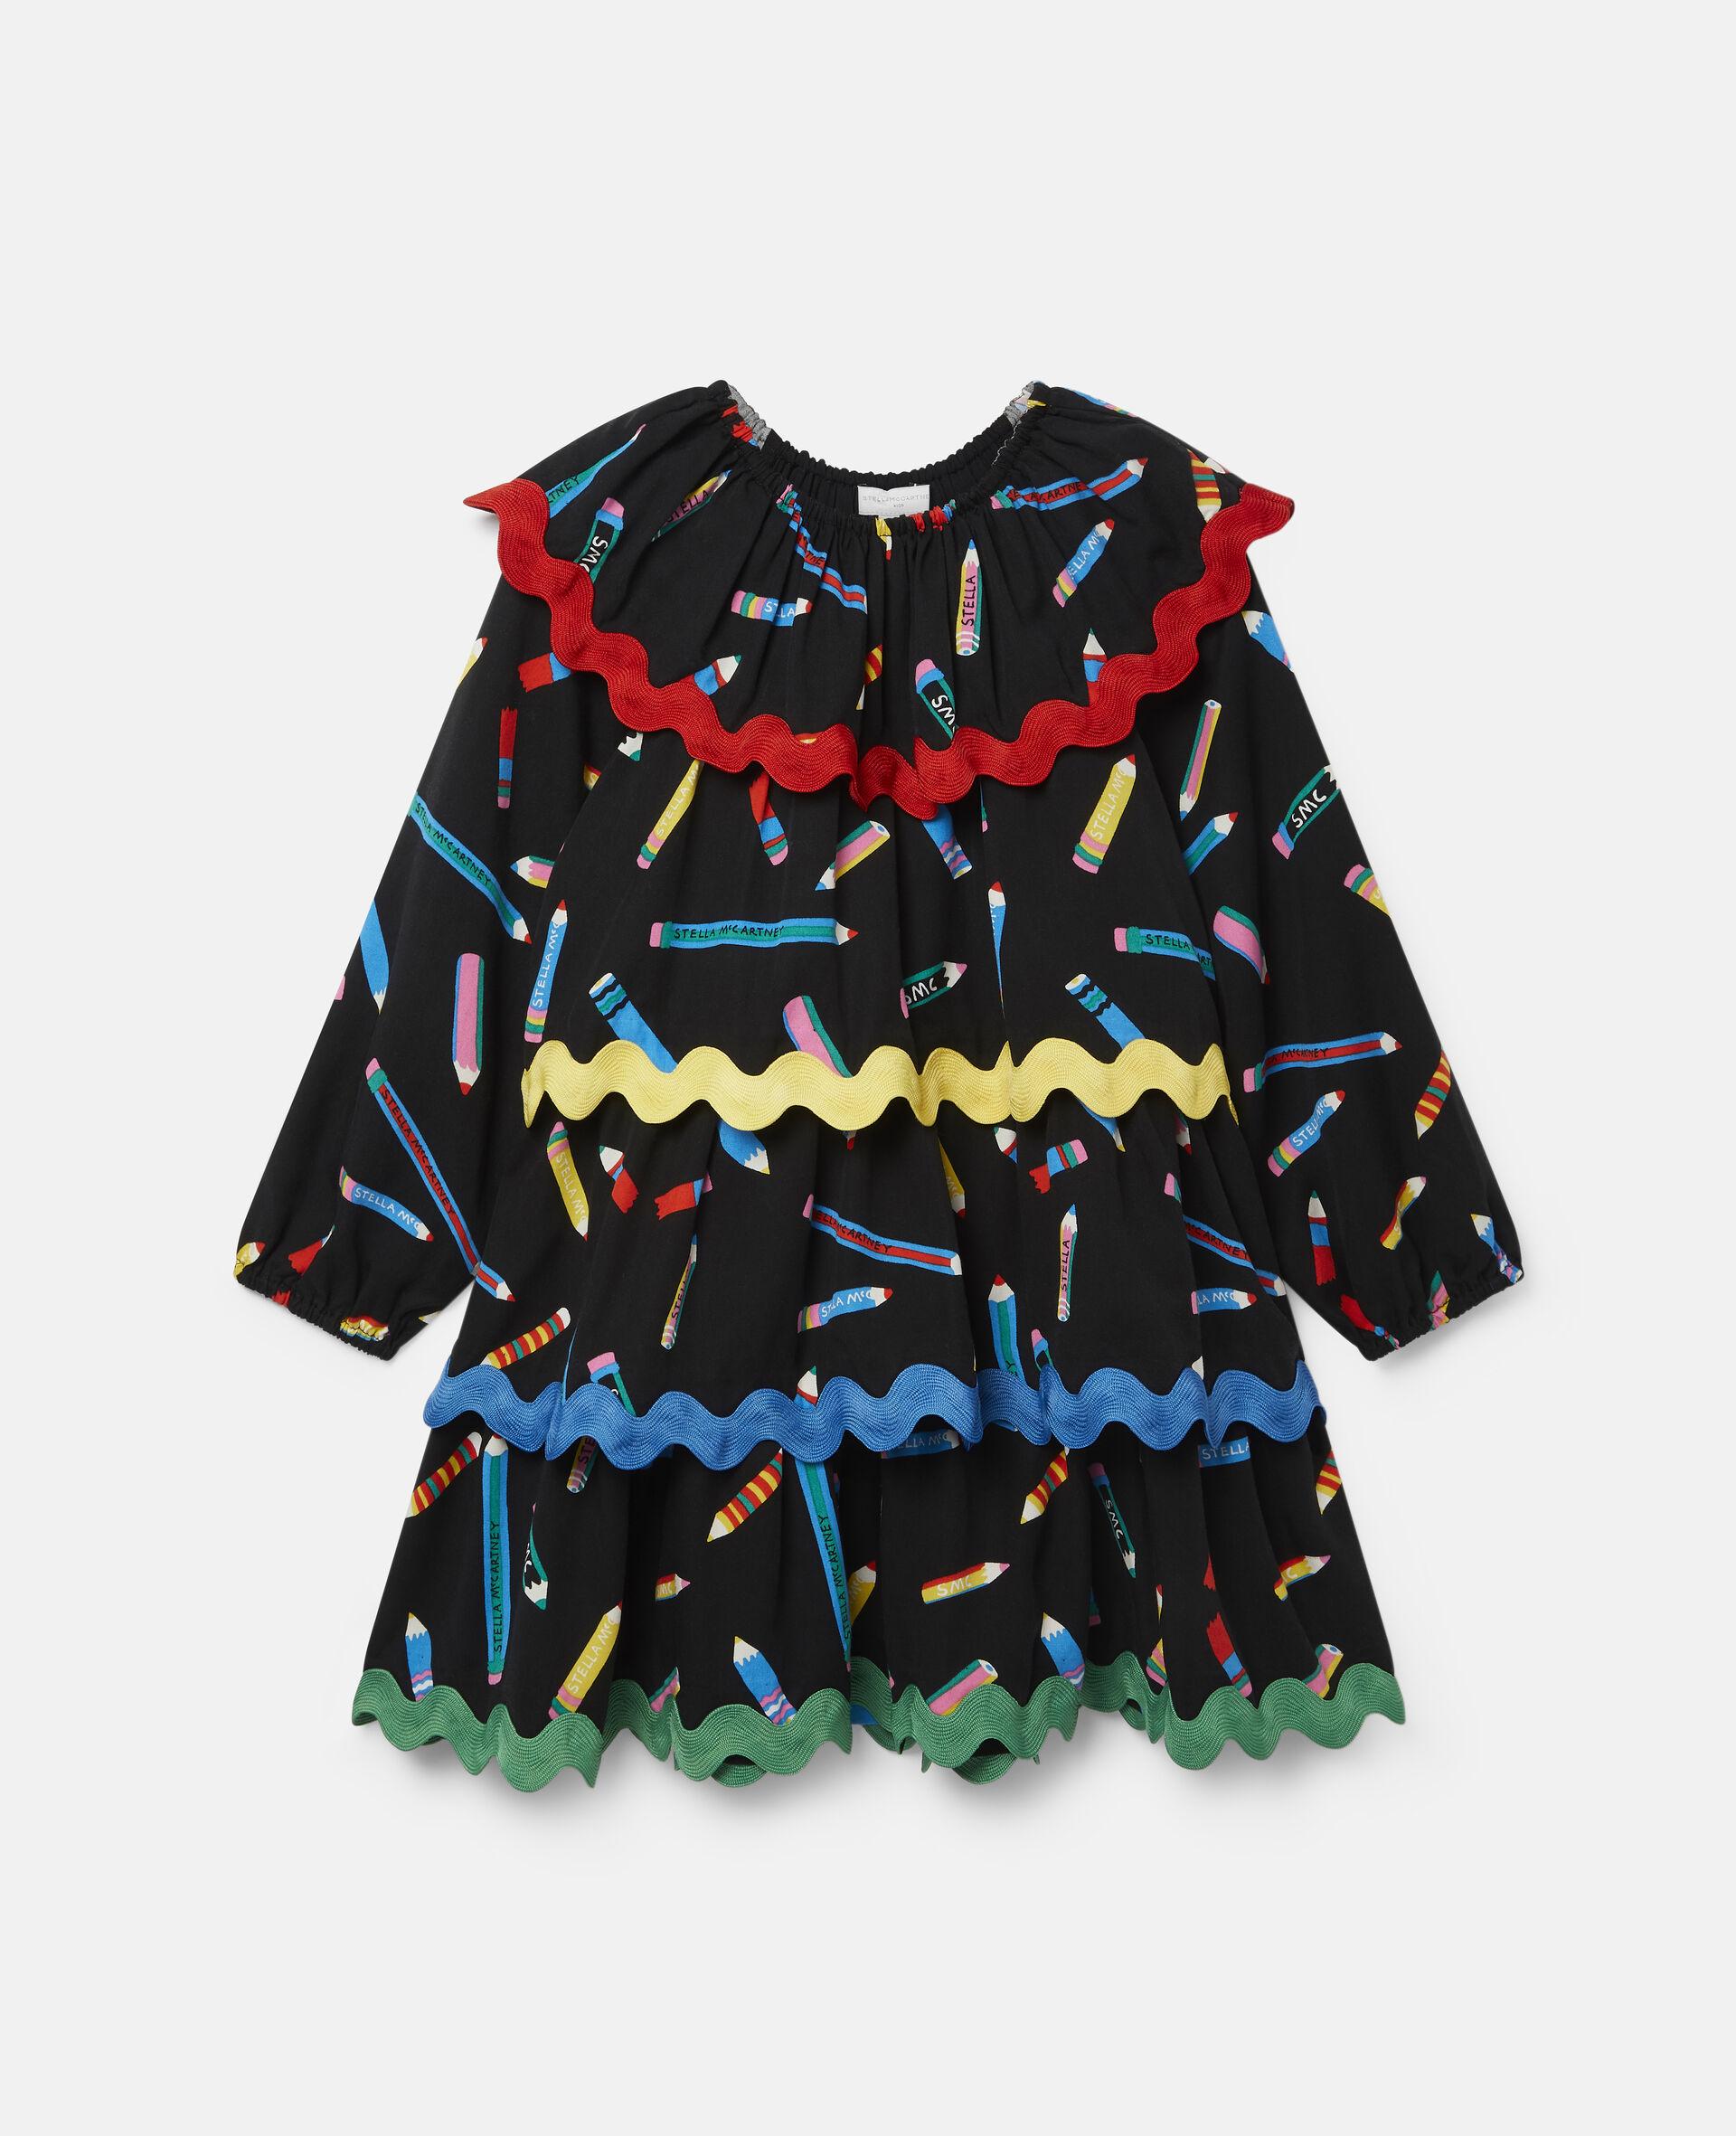 铅笔印花分层斜纹布连衣裙 -黑色-large image number 0